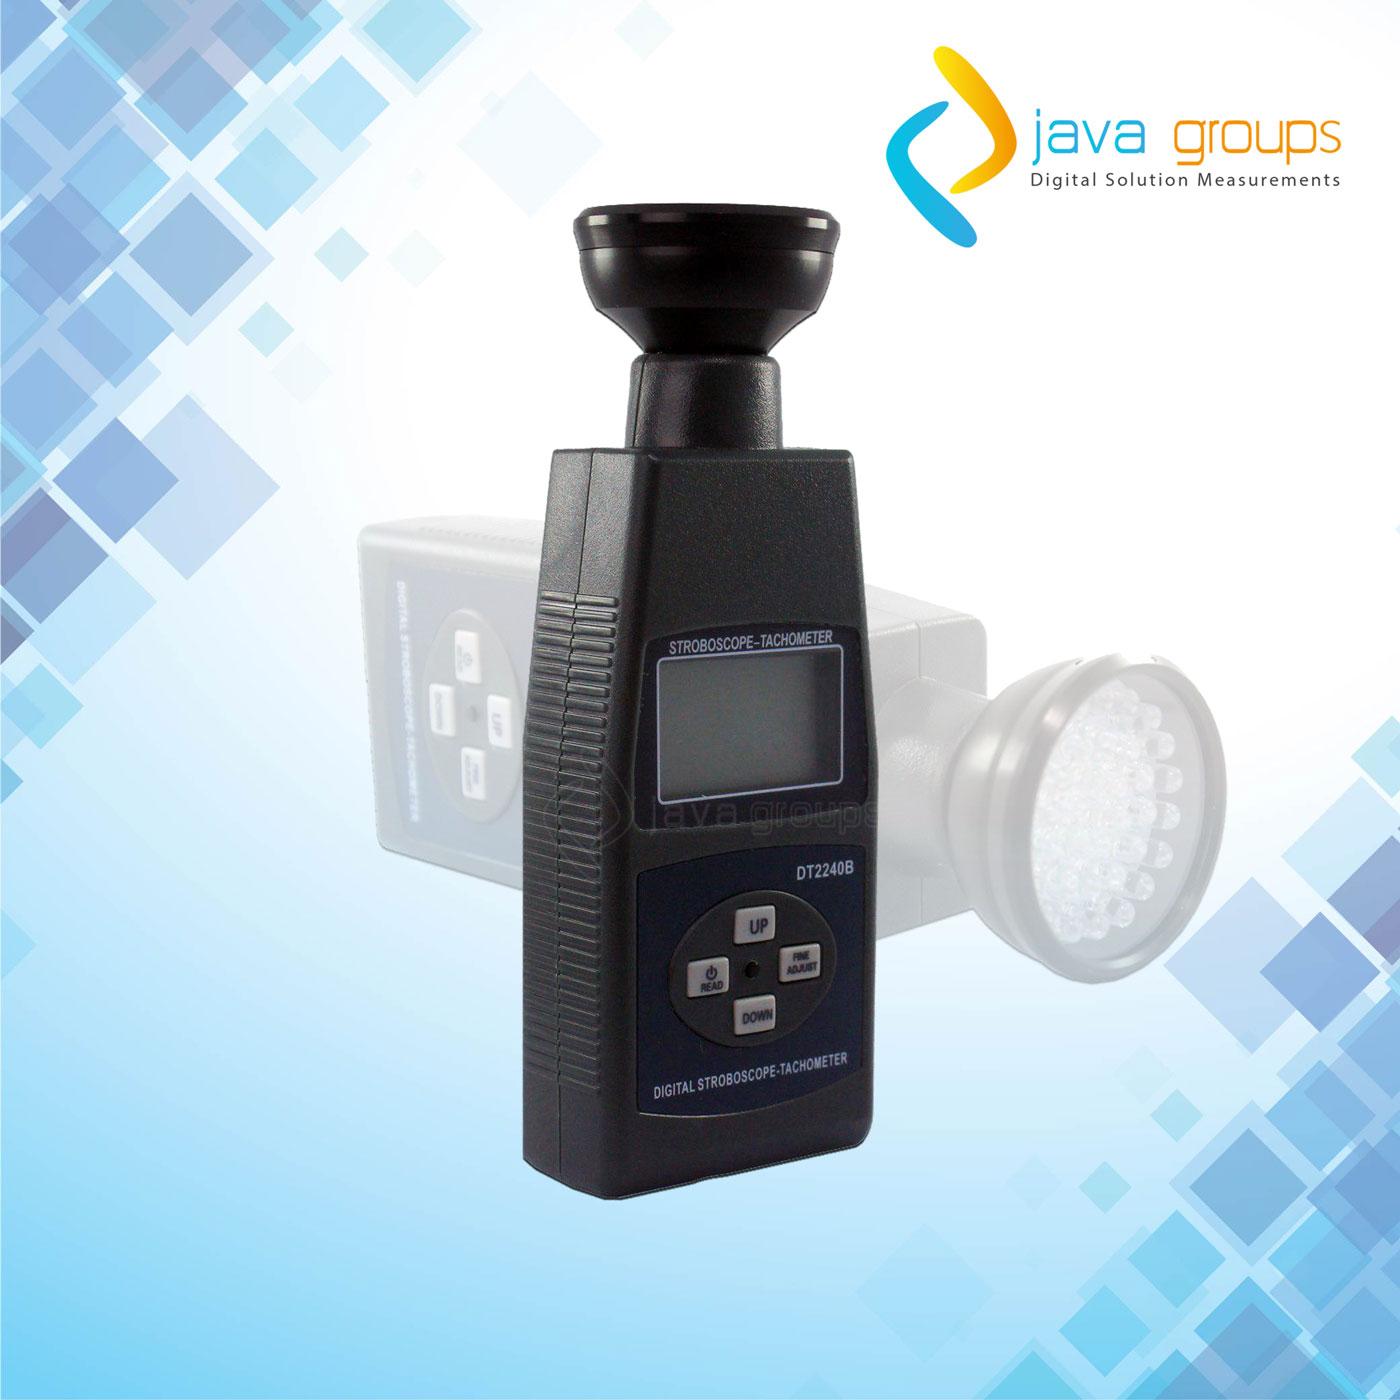 Alat Pendeteksi Kecepatan Benda Bergerak Stroboscope Digital DT2240B